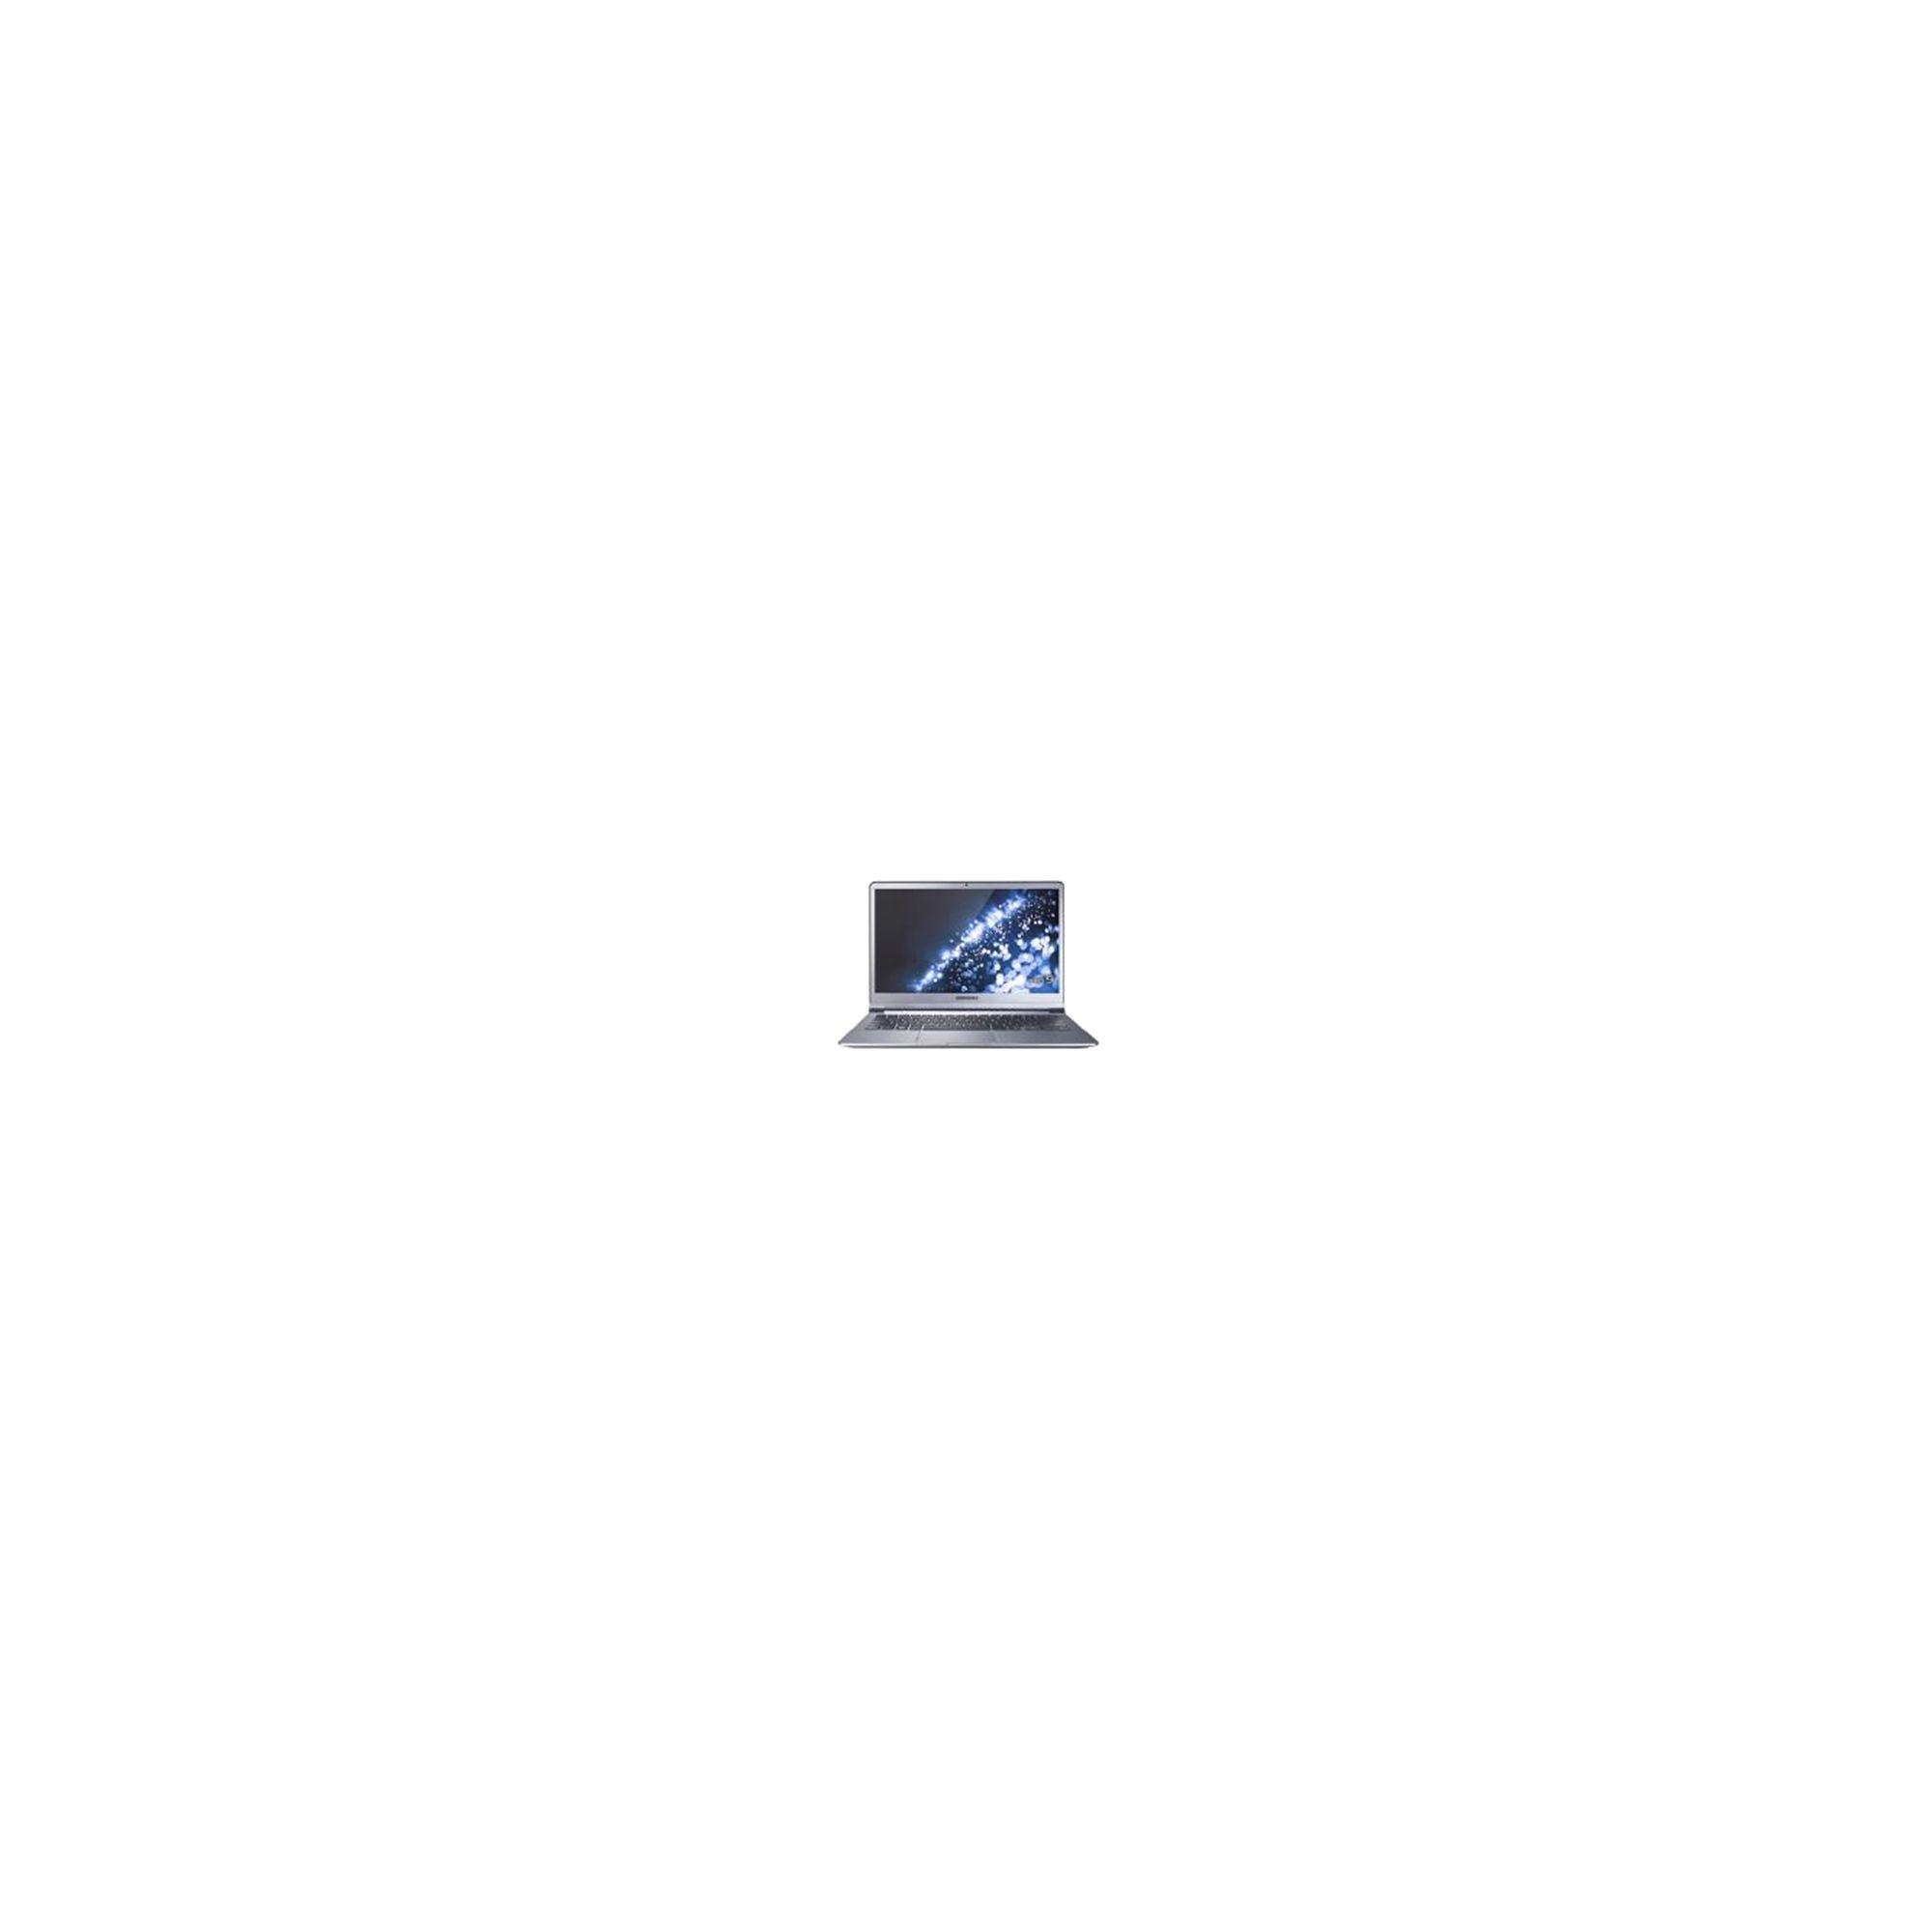 Samsung Series 9 NP900X3D (13.3 inch) Notebook PC Core i5 (2537M) 1.4GHz 4GB 128GB SSD WLAN BT Webcam Windows 8 64-bit (HD Graphics 3000) at Tesco Direct